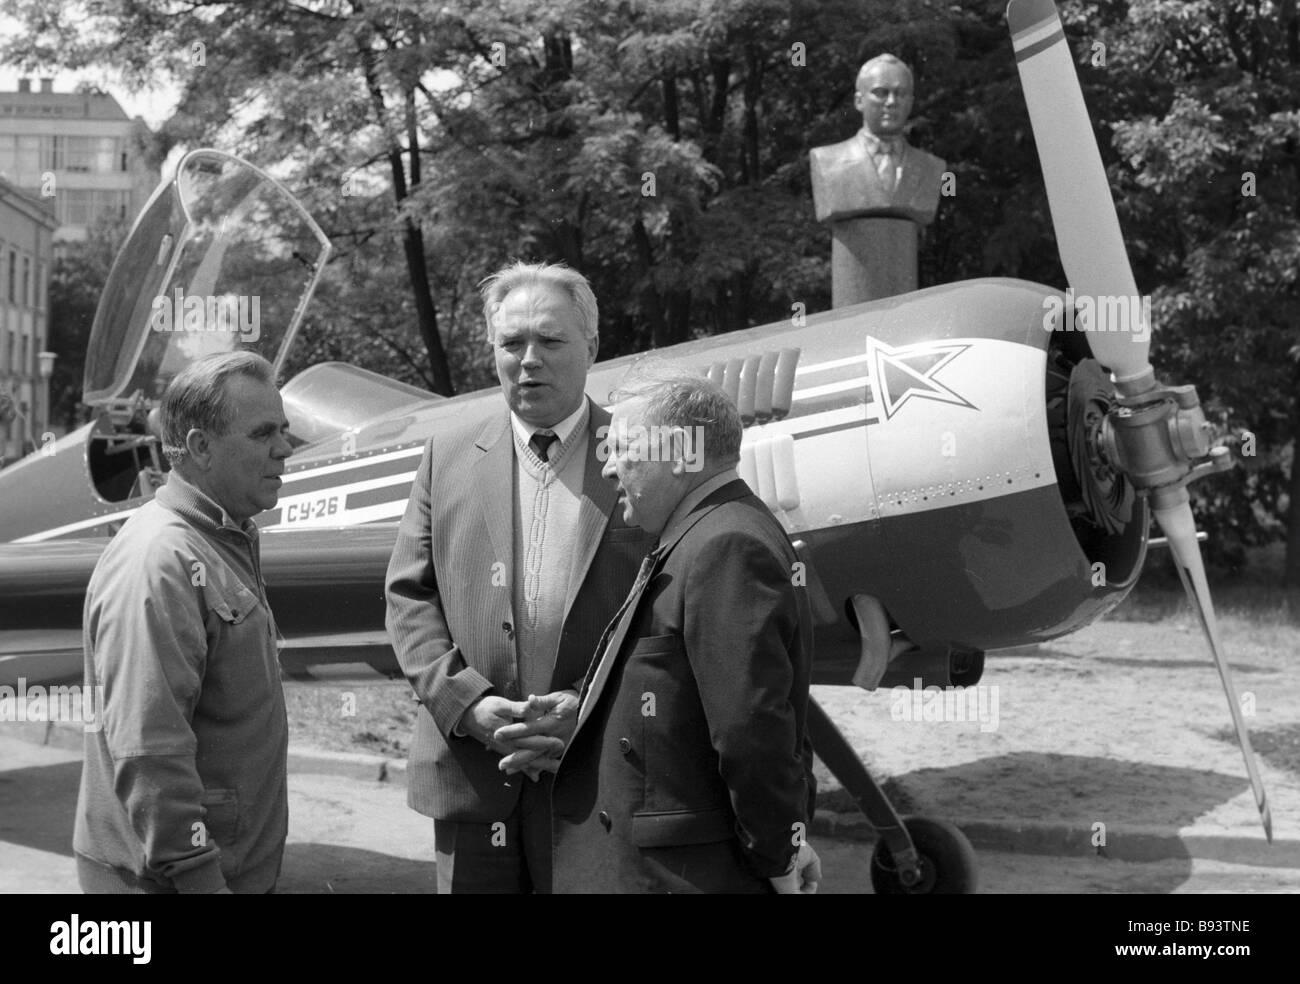 M Pakhomov chief aerobatic plane builder of the Sukhoi design bureau M Simonov chief designer of the Sukhoi design - Stock Image